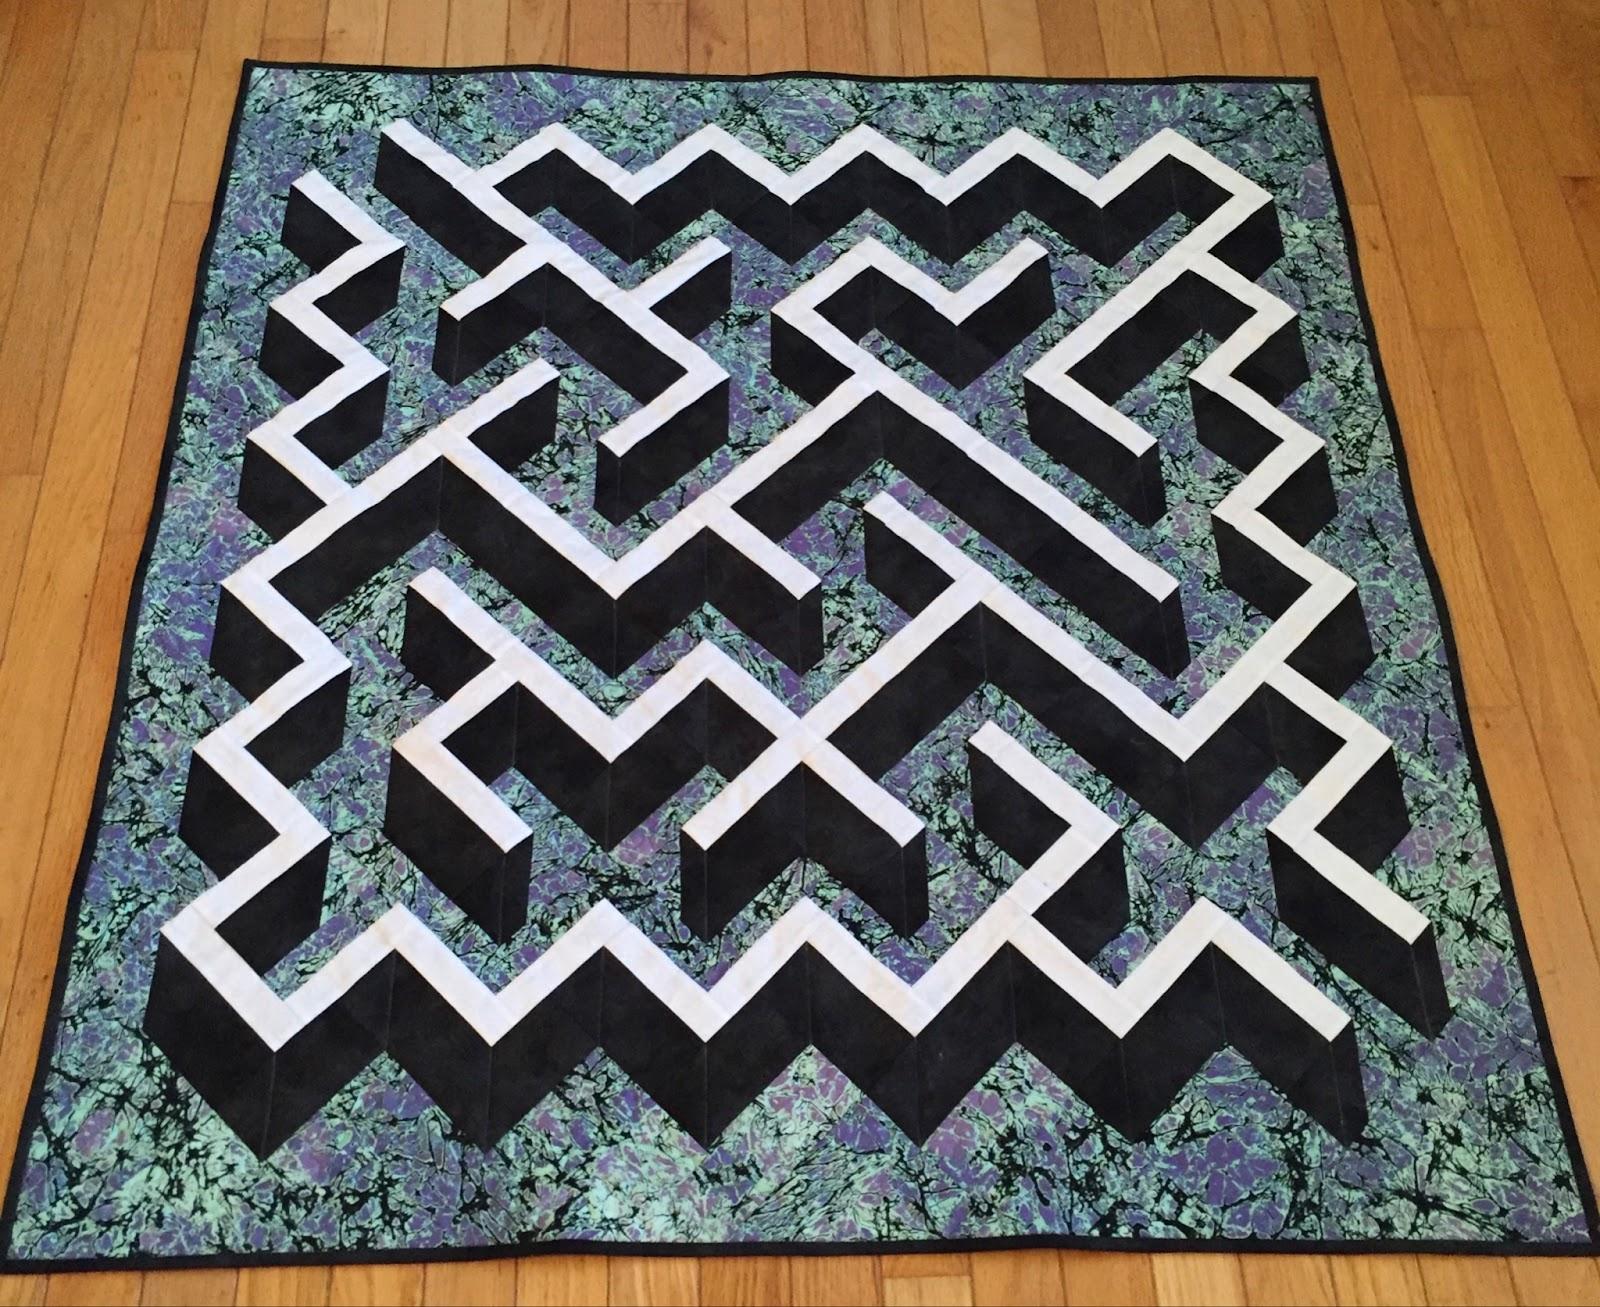 3D maze on the diagonal